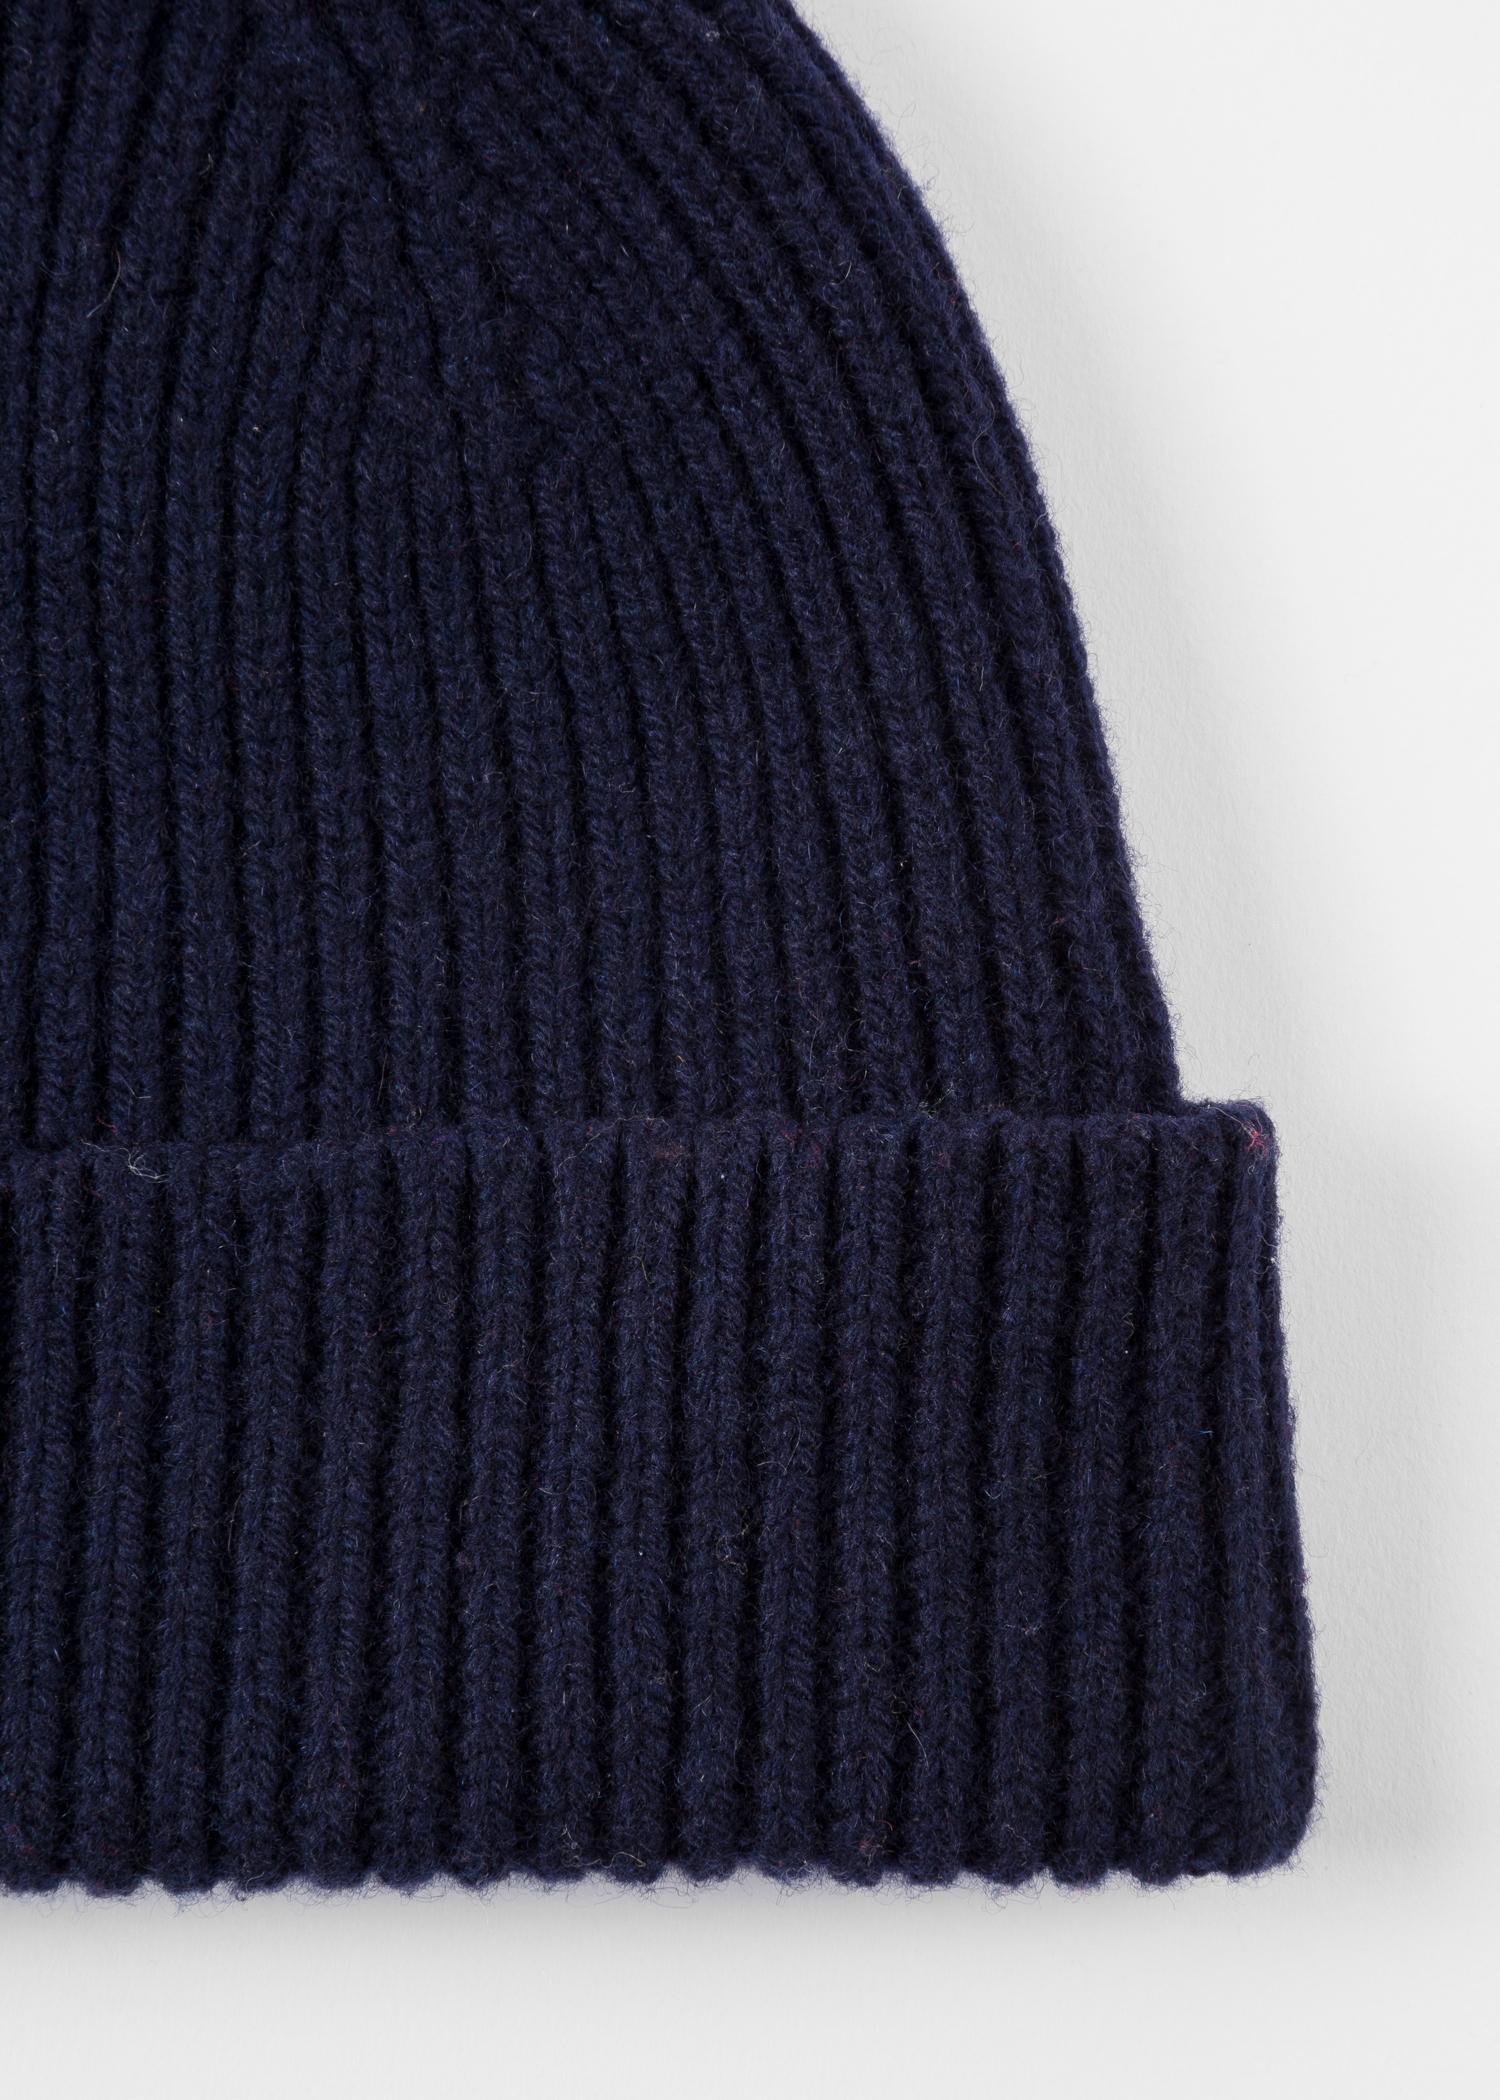 49d39131026 Men s Navy Cashmere-Blend Ribbed Beanie Hat - Paul Smith US